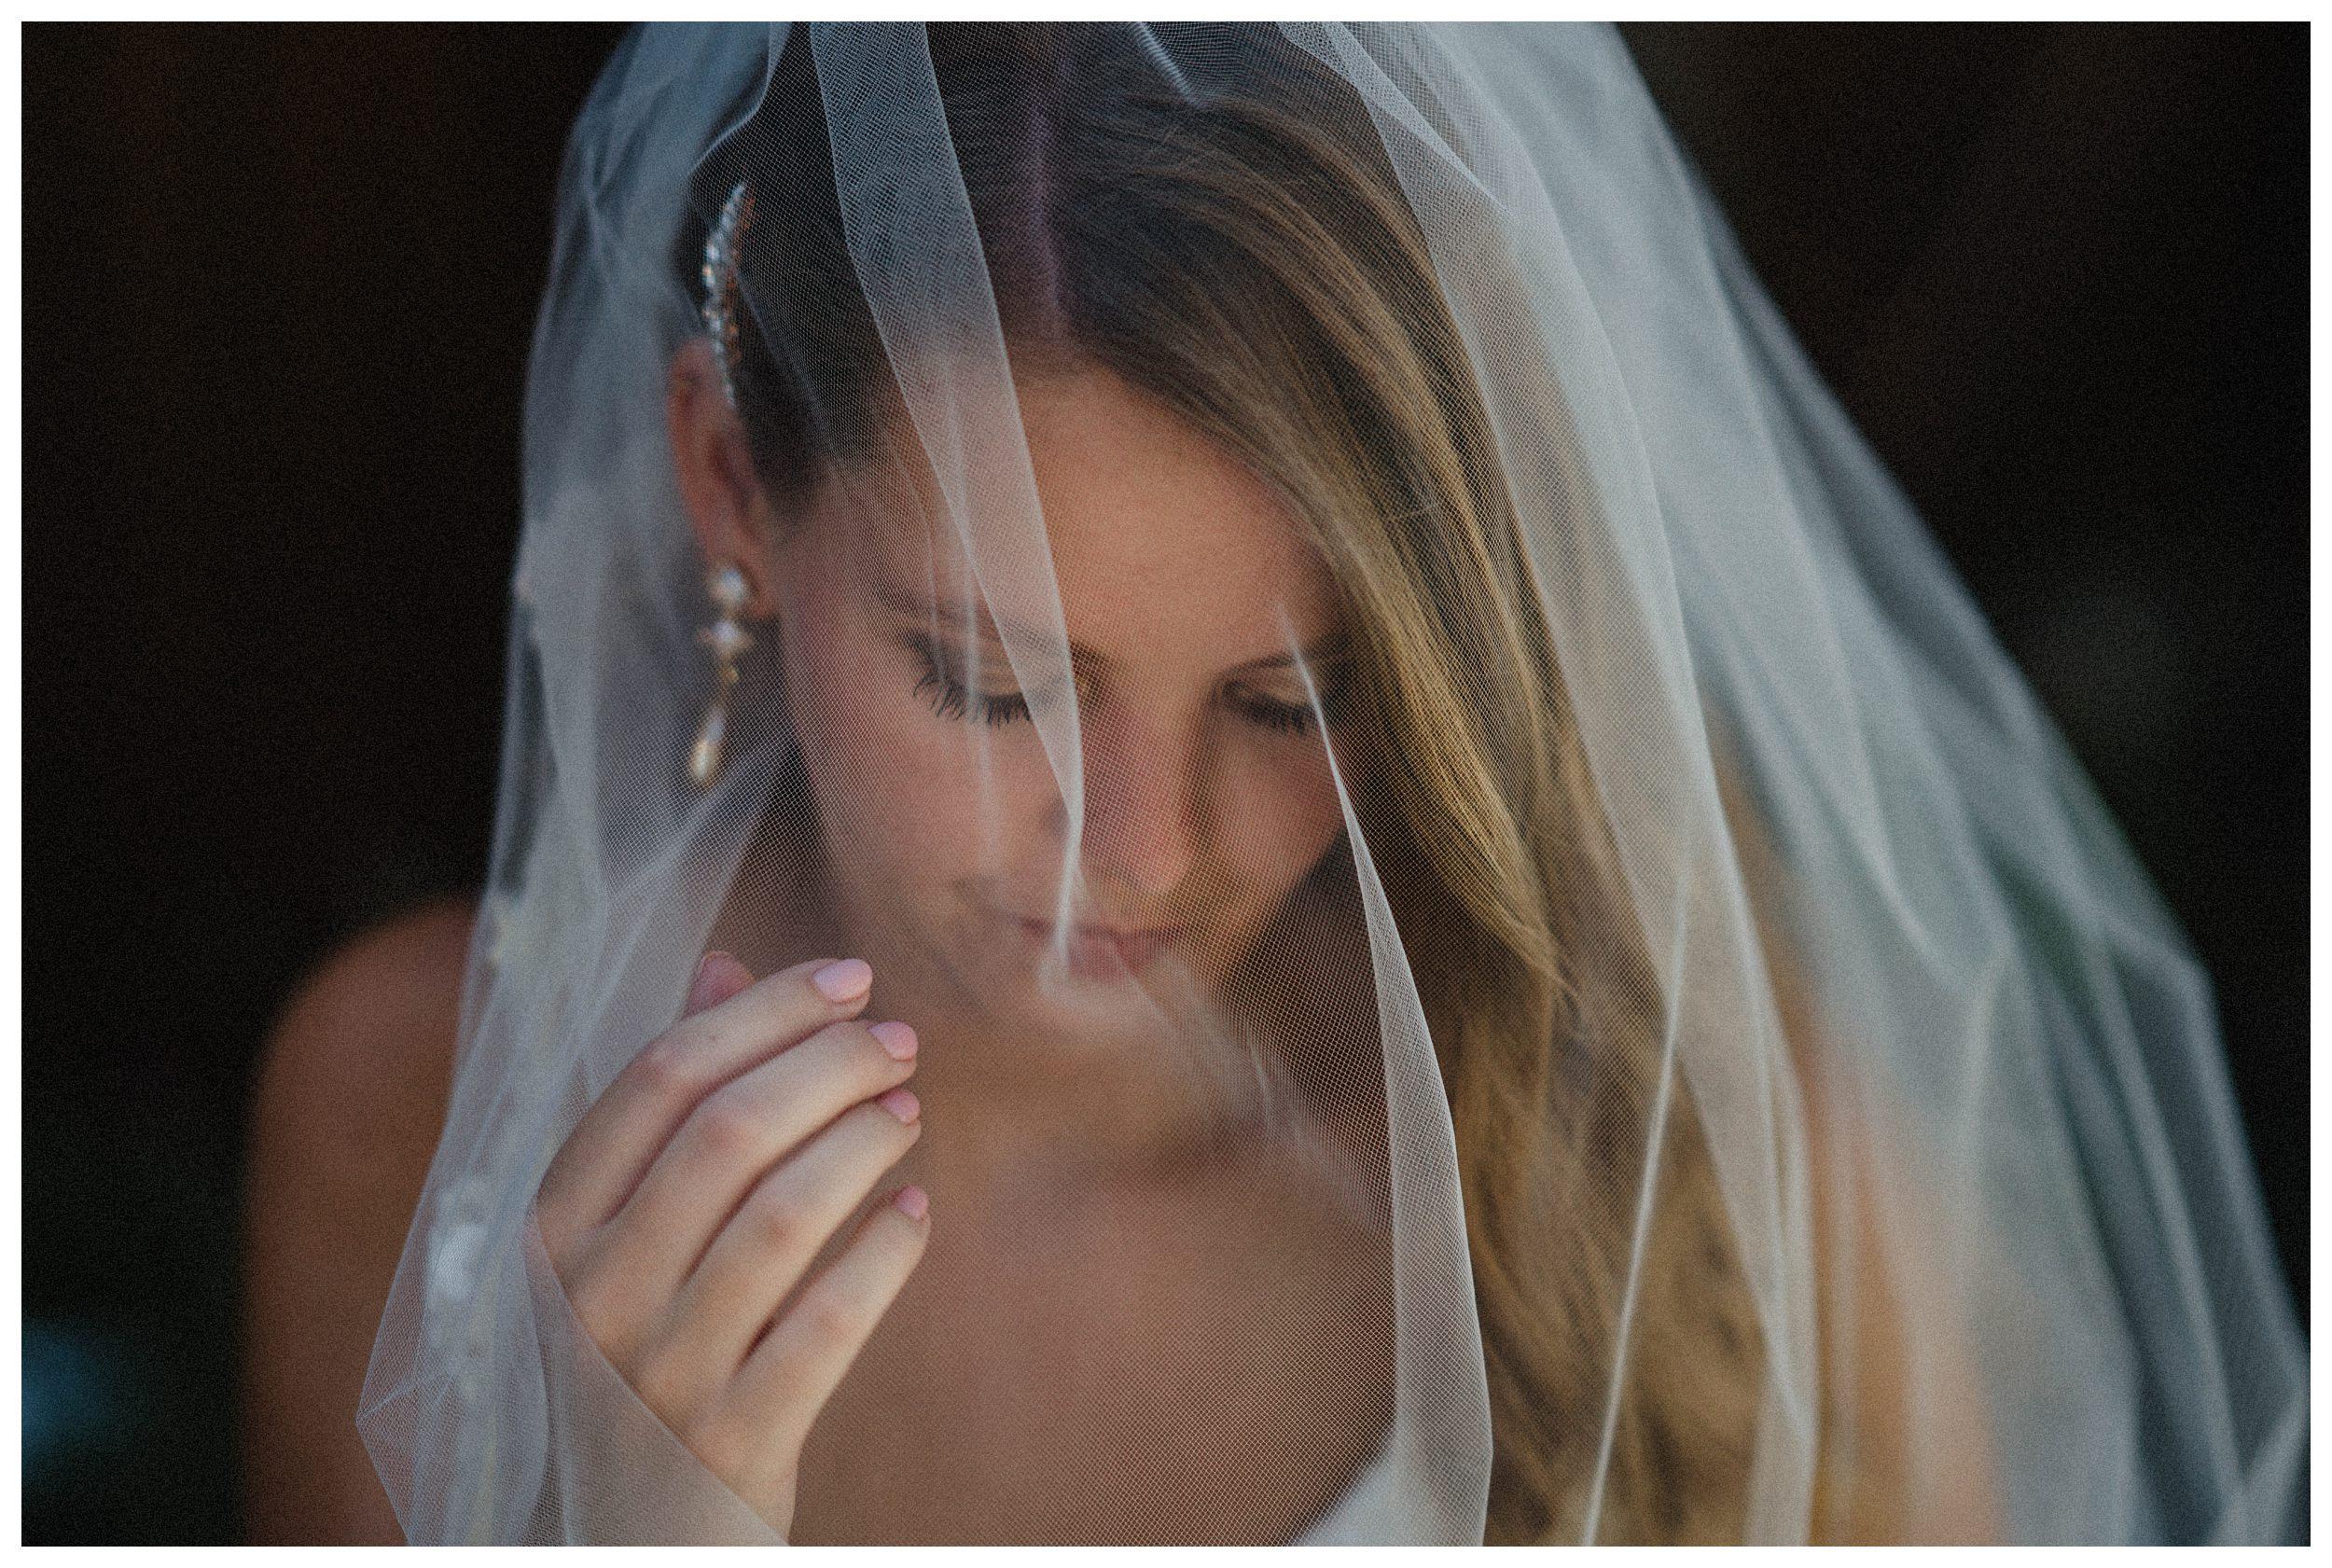 huwelijksfotograaf bruidsfotograaf destinationwedding huwelijksfotografie in ardennen nederland (54).jpg